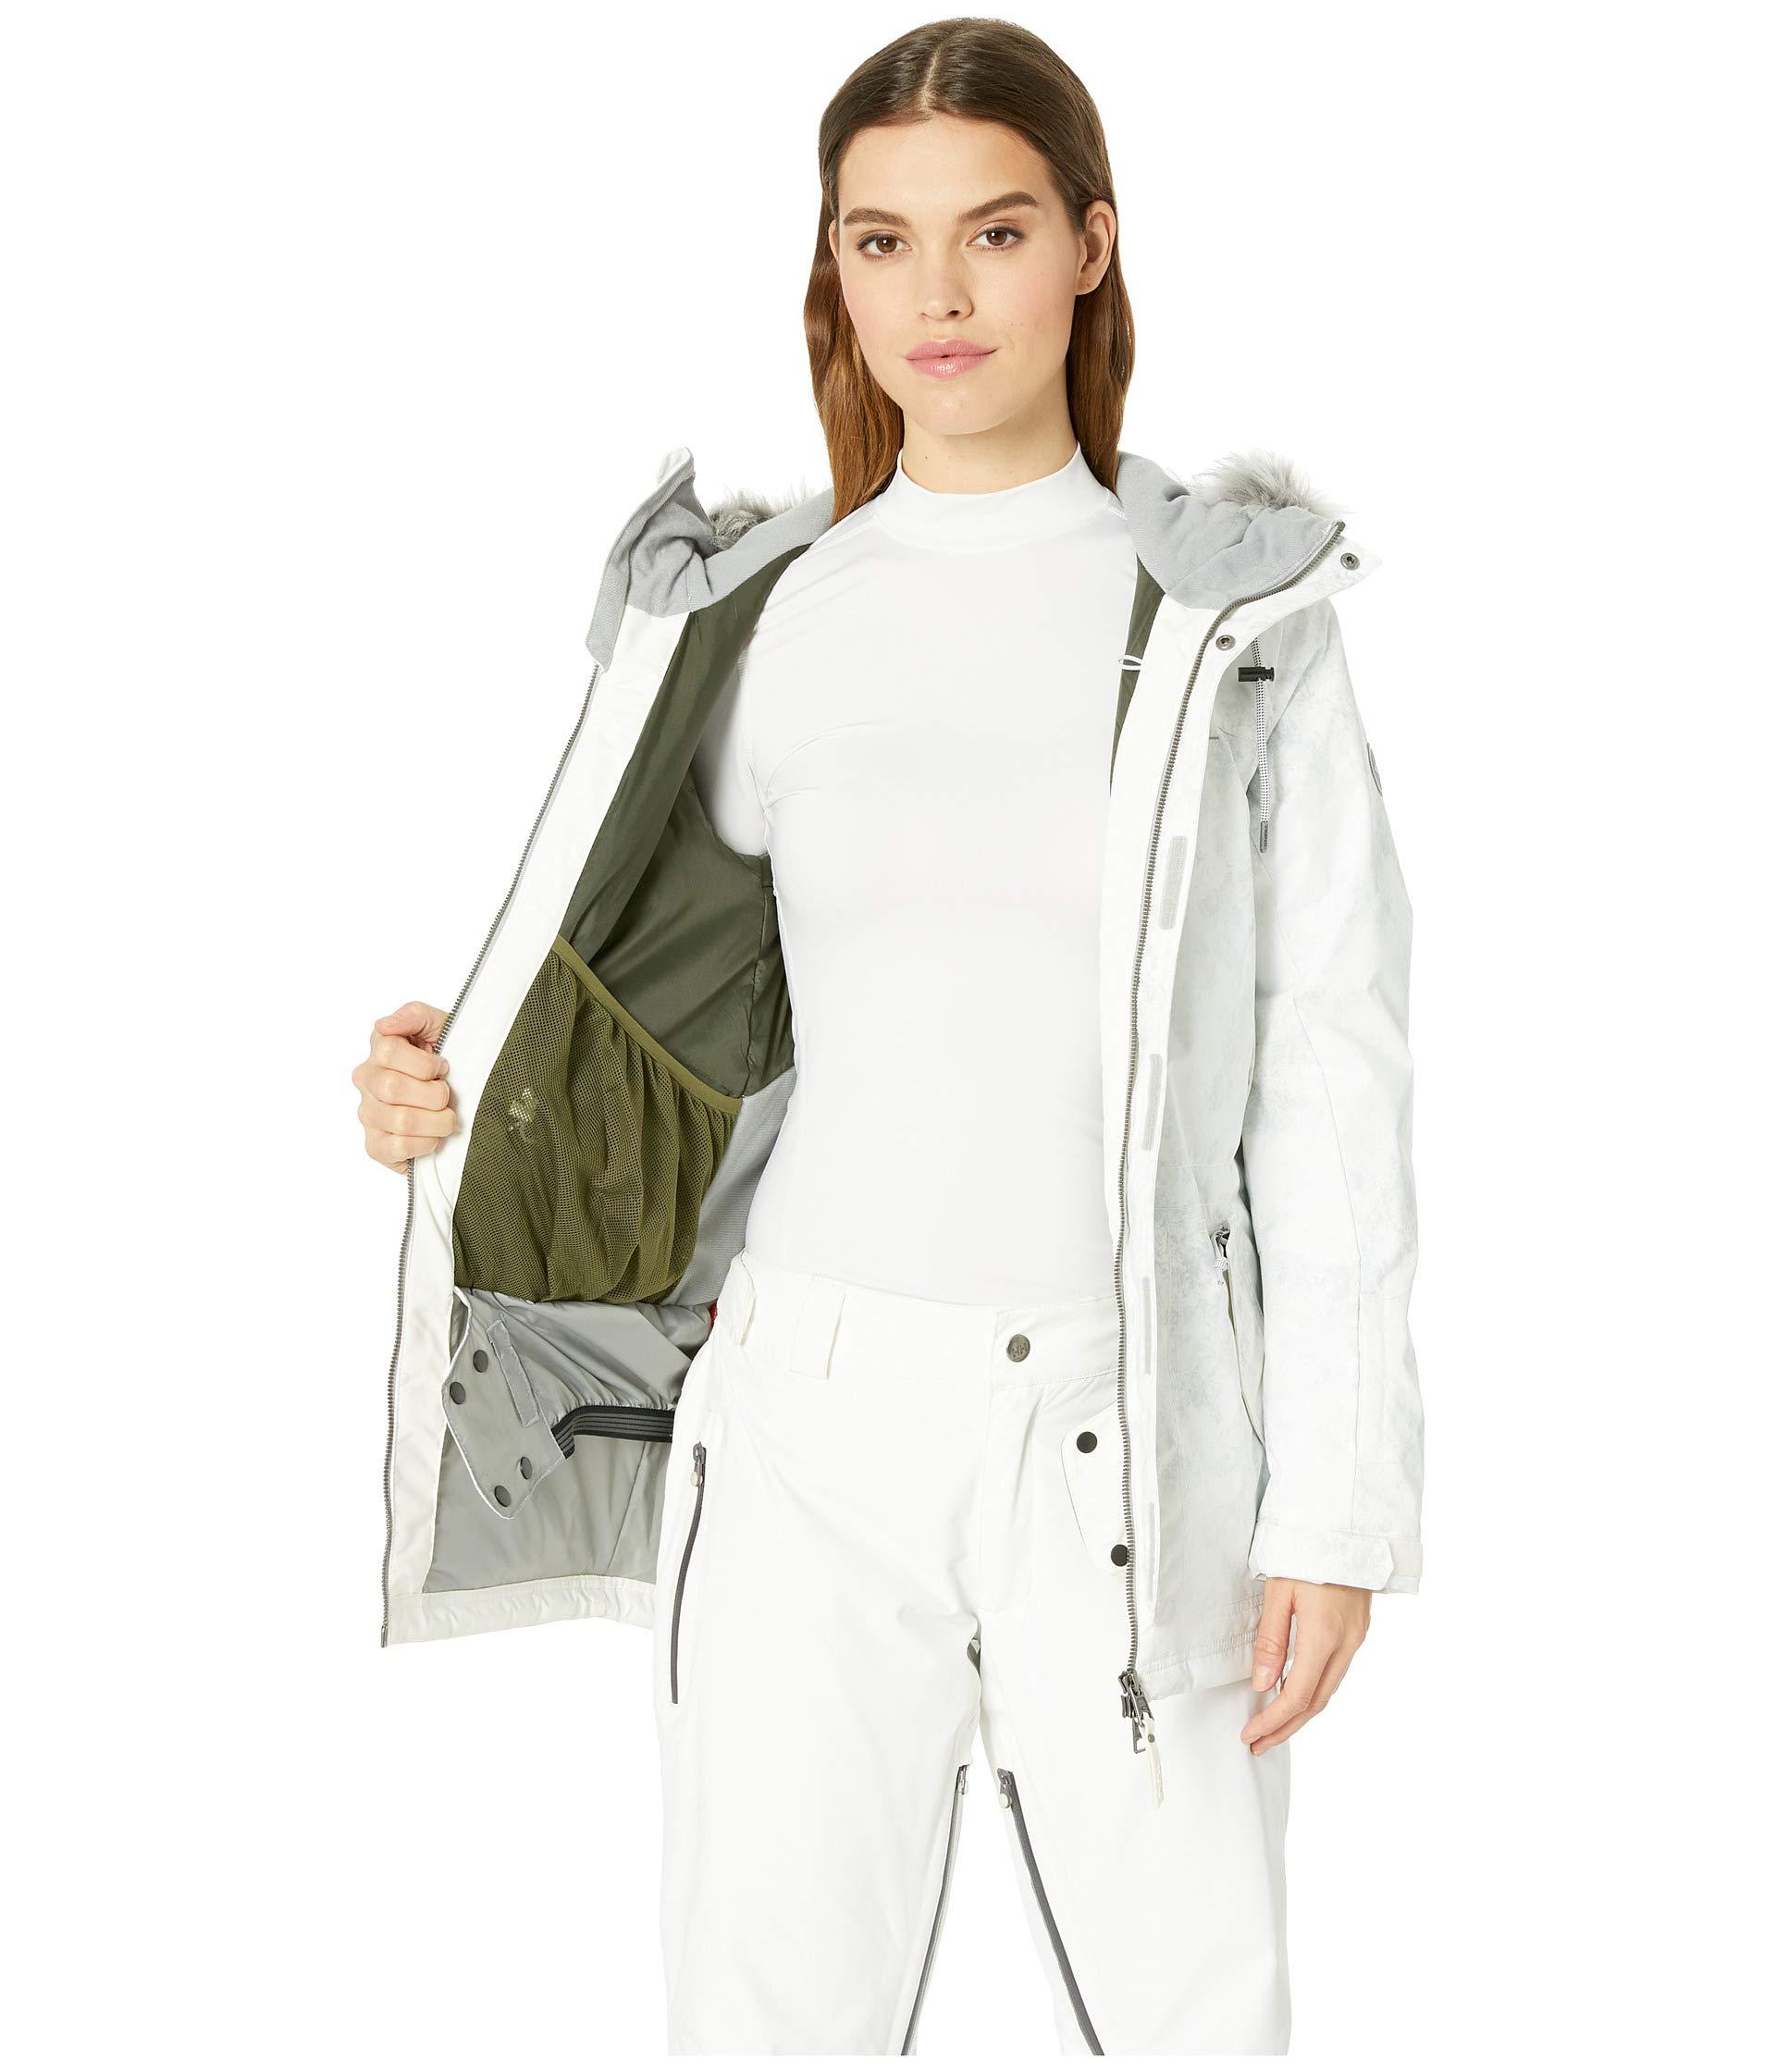 Cluster Hybrid Iii Aop Grey white Jacket O'neill Rq5vnff